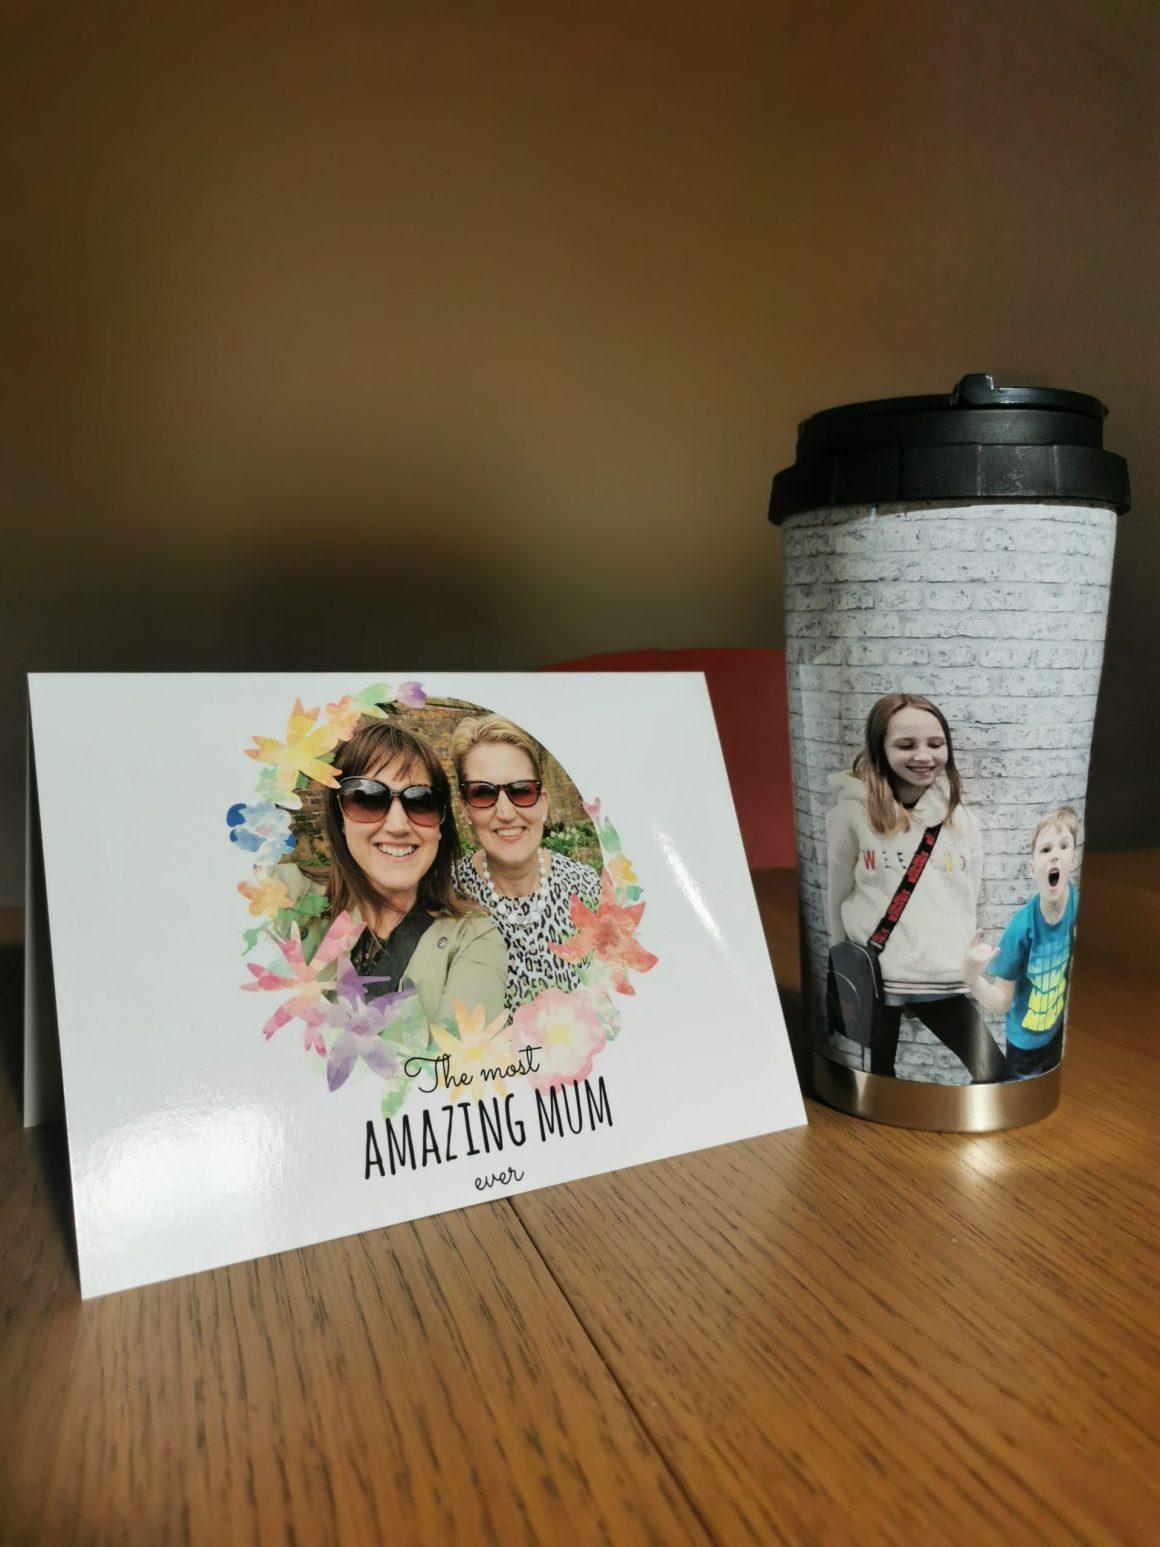 Asda Photo Gifts